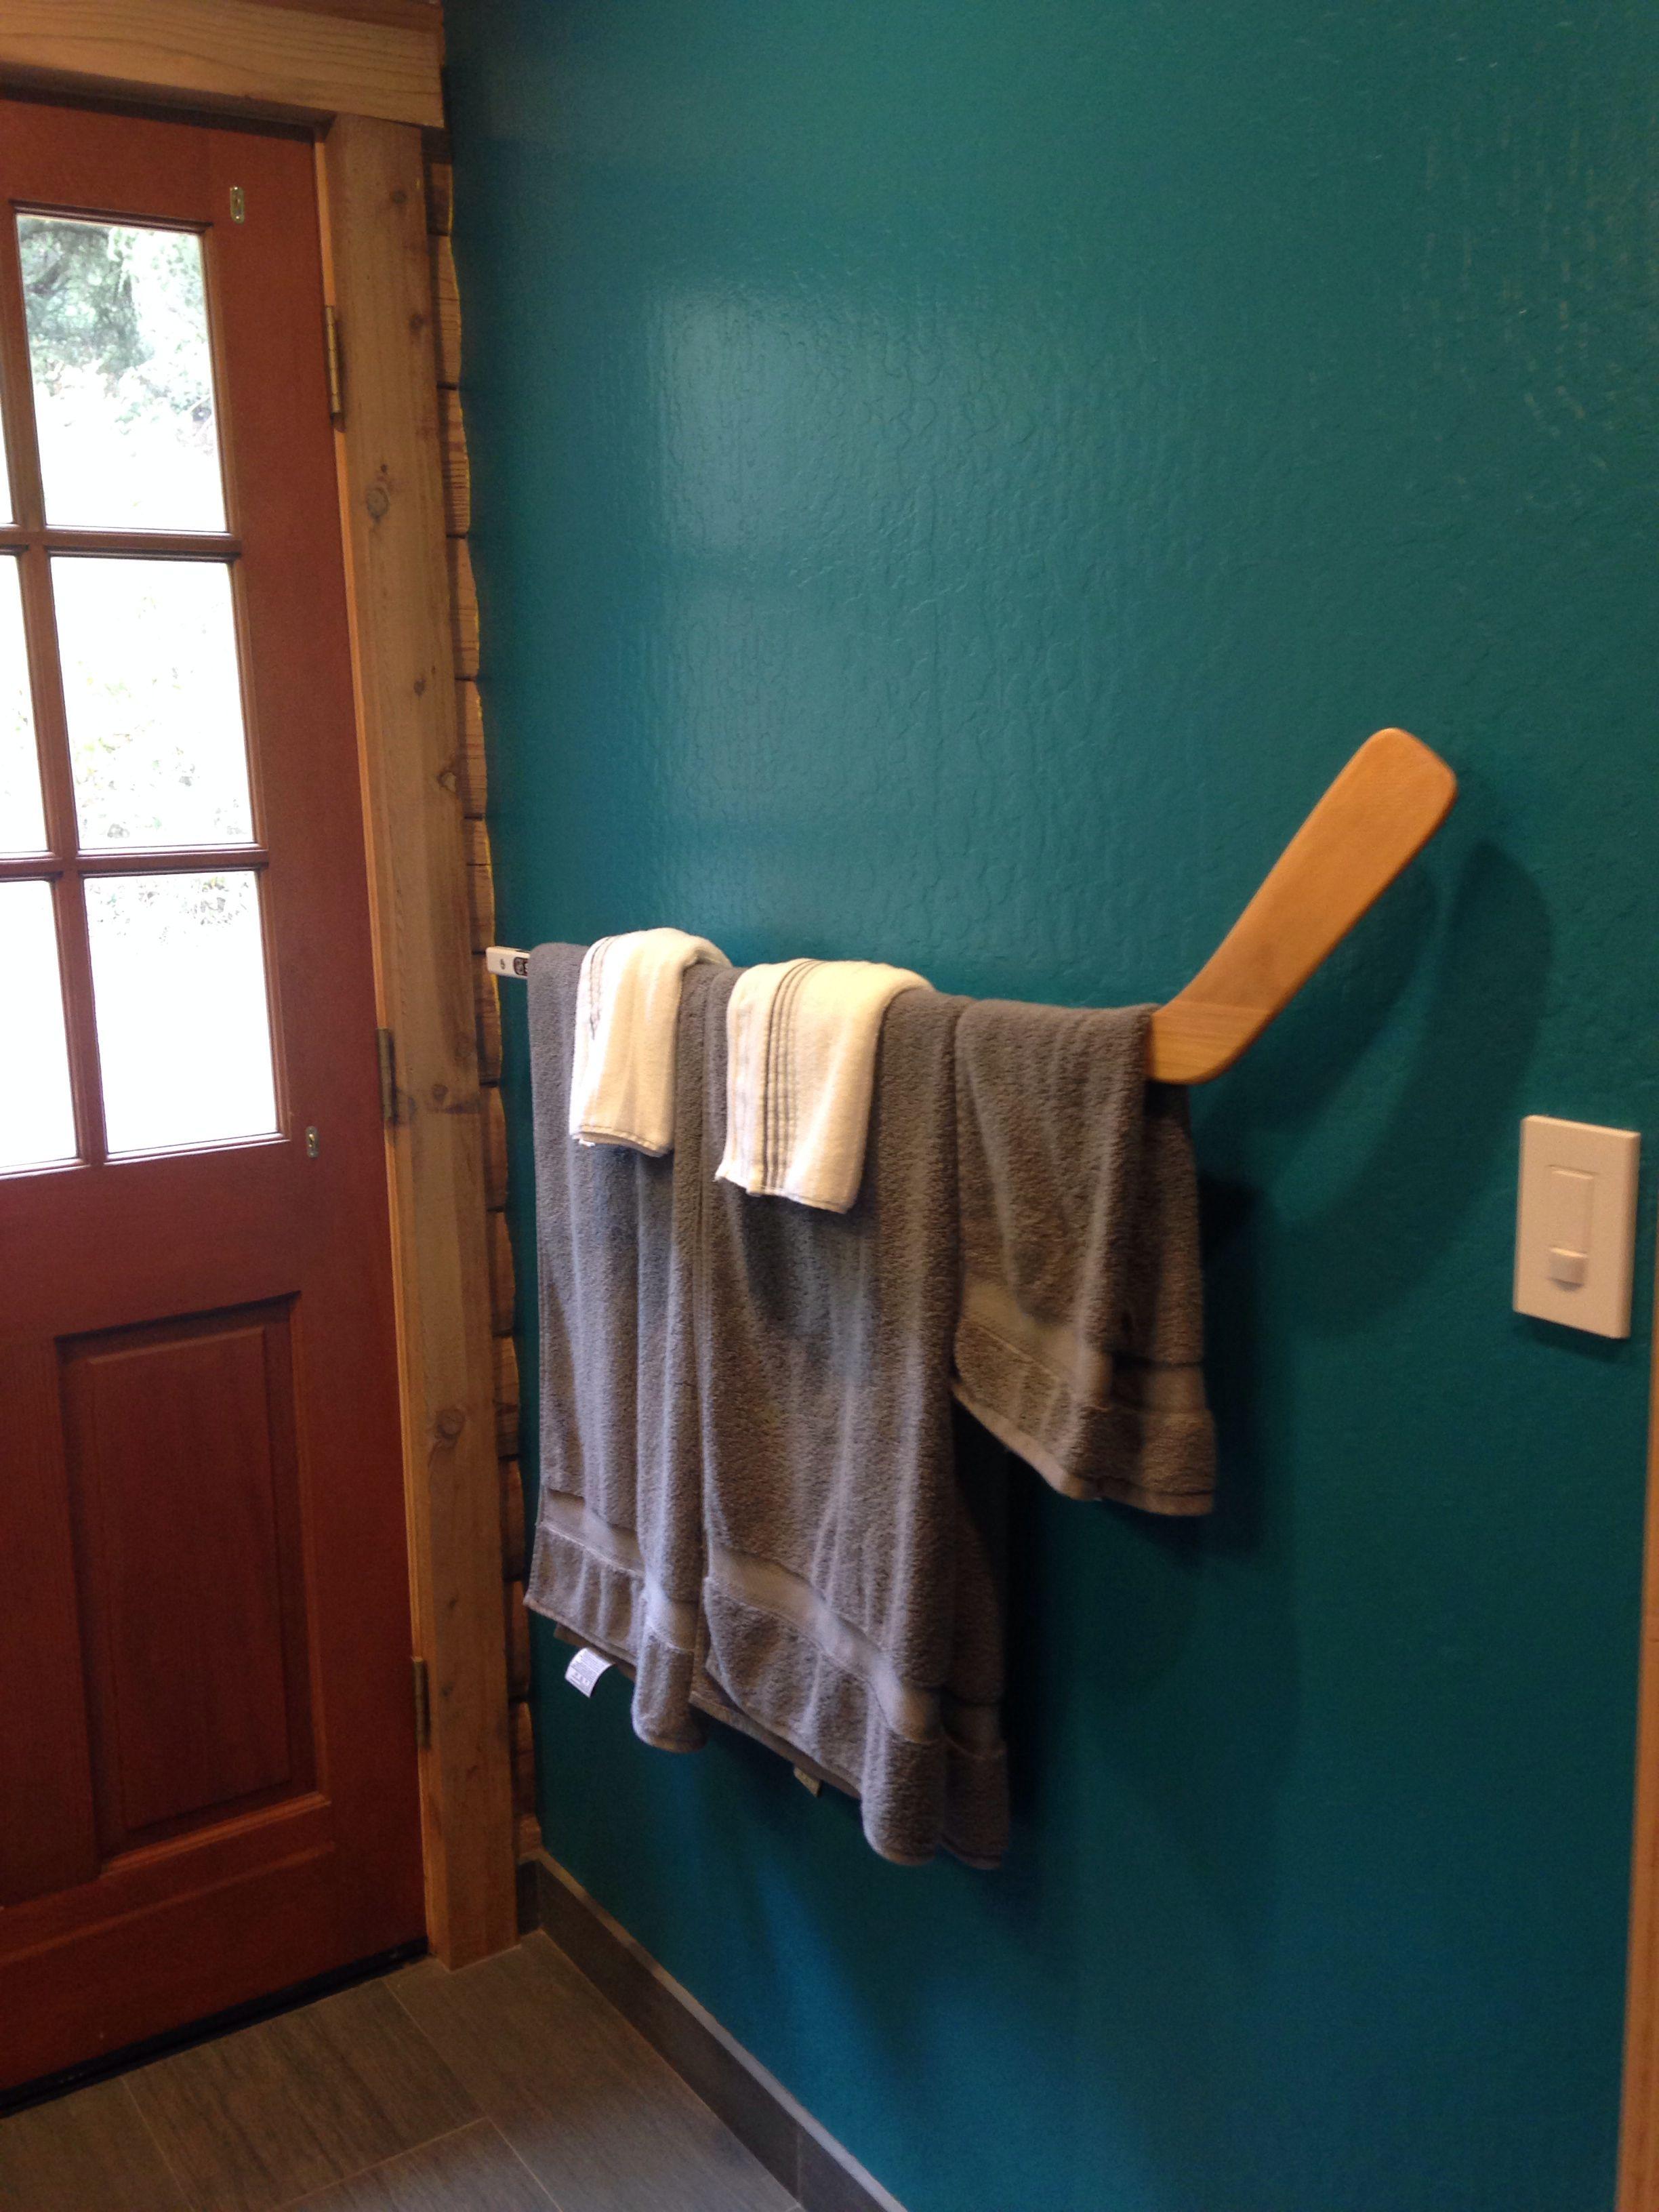 Hockey Stick towel bar for Kids Bath   For the Home   Pinterest ...